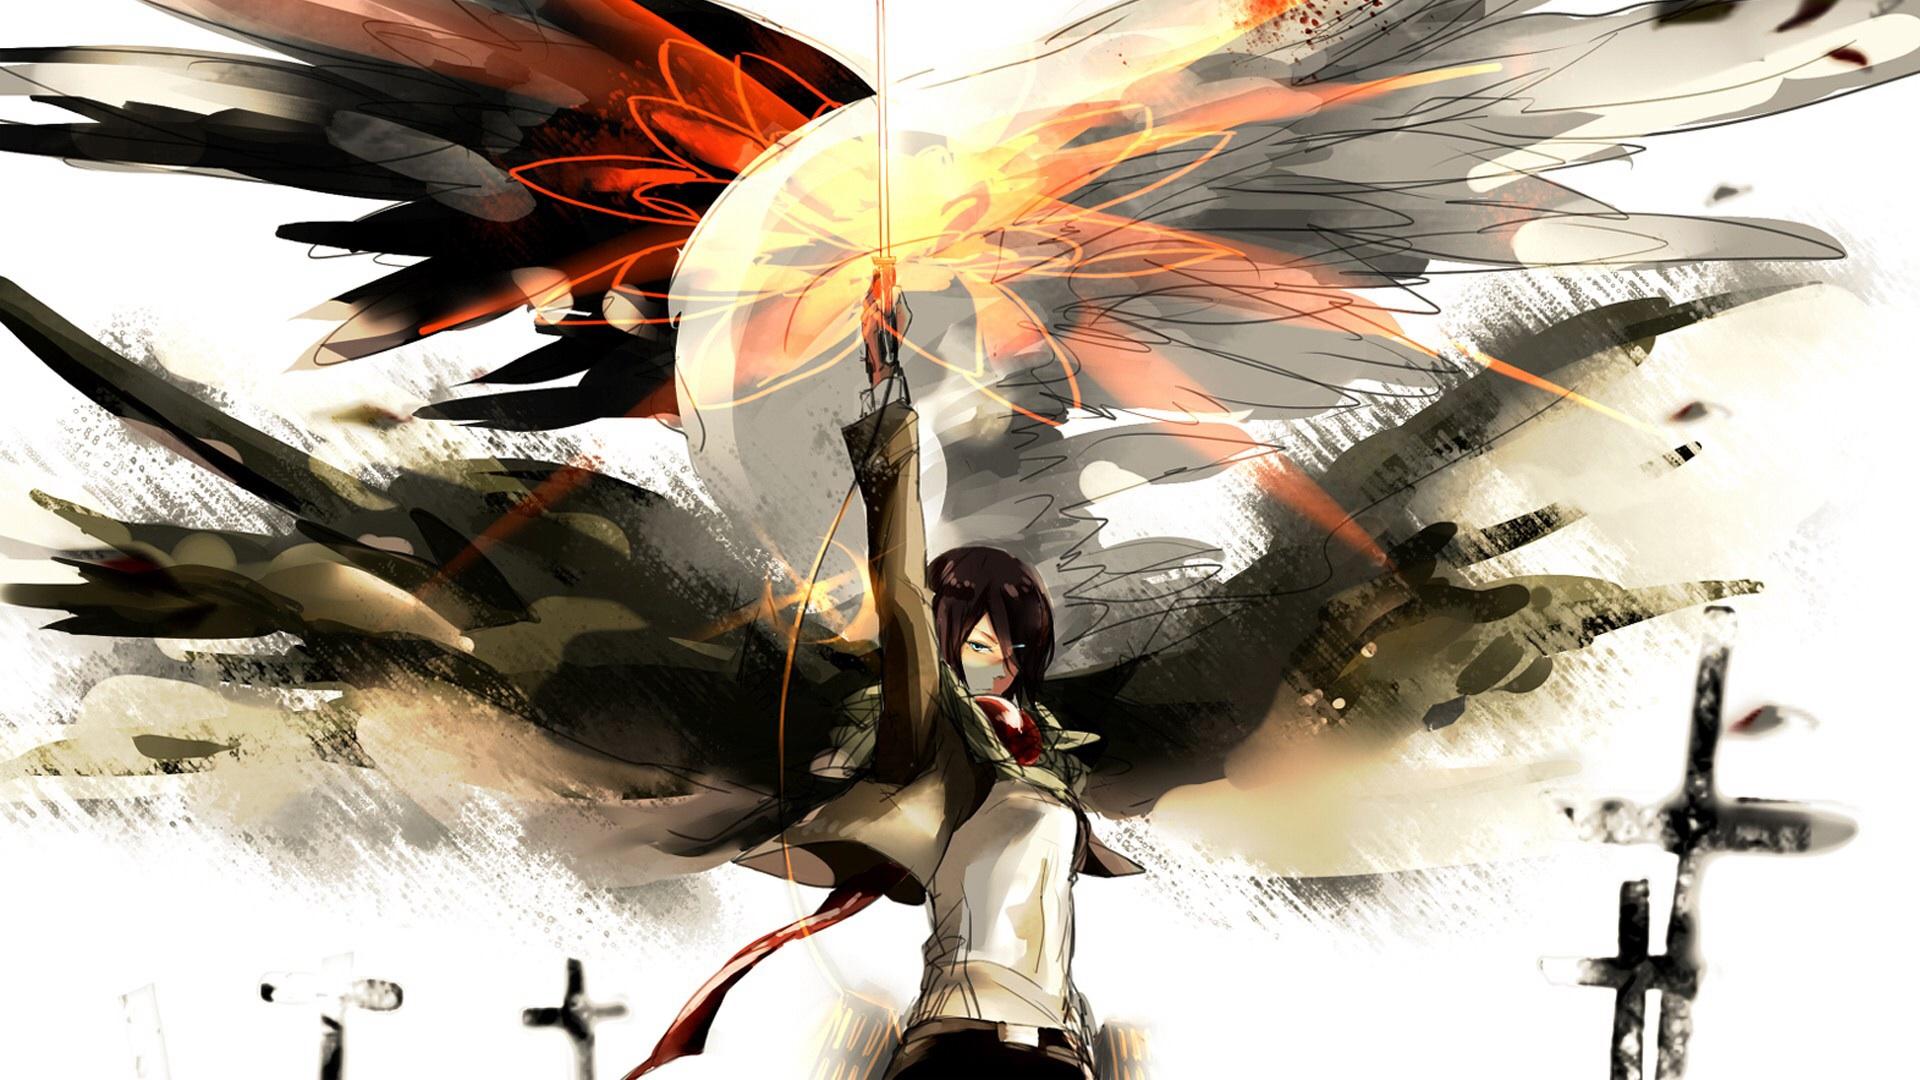 Mikasa Wallpaper - Attack On Titan Wallpaper Mikasa - HD Wallpaper